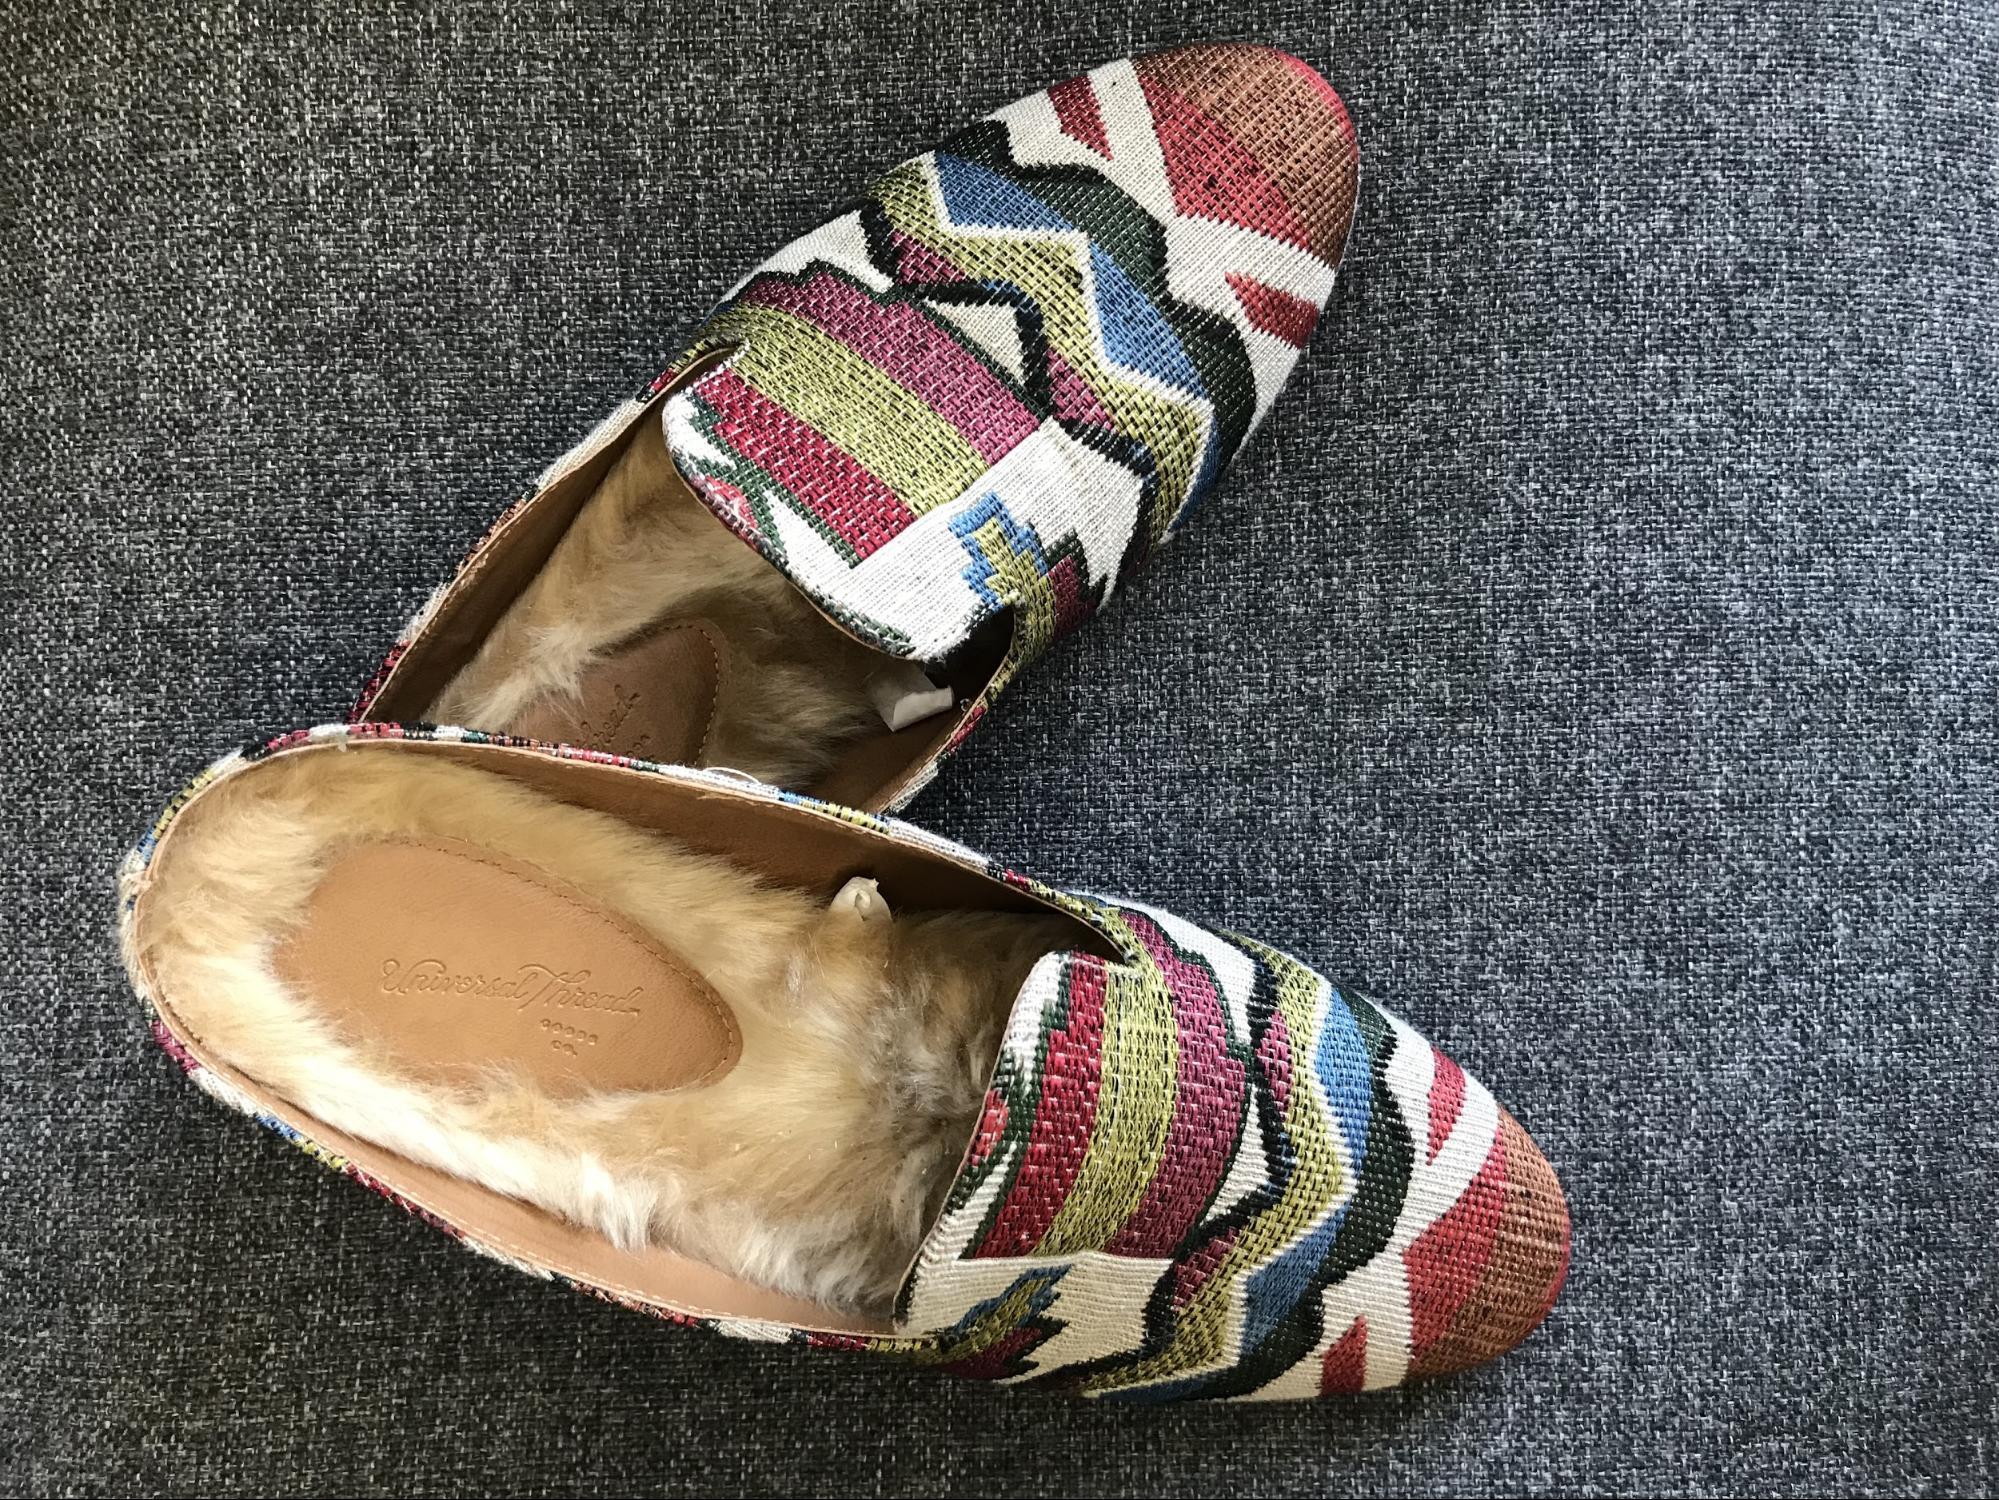 image-of-geometric-statement-shoes.jpg